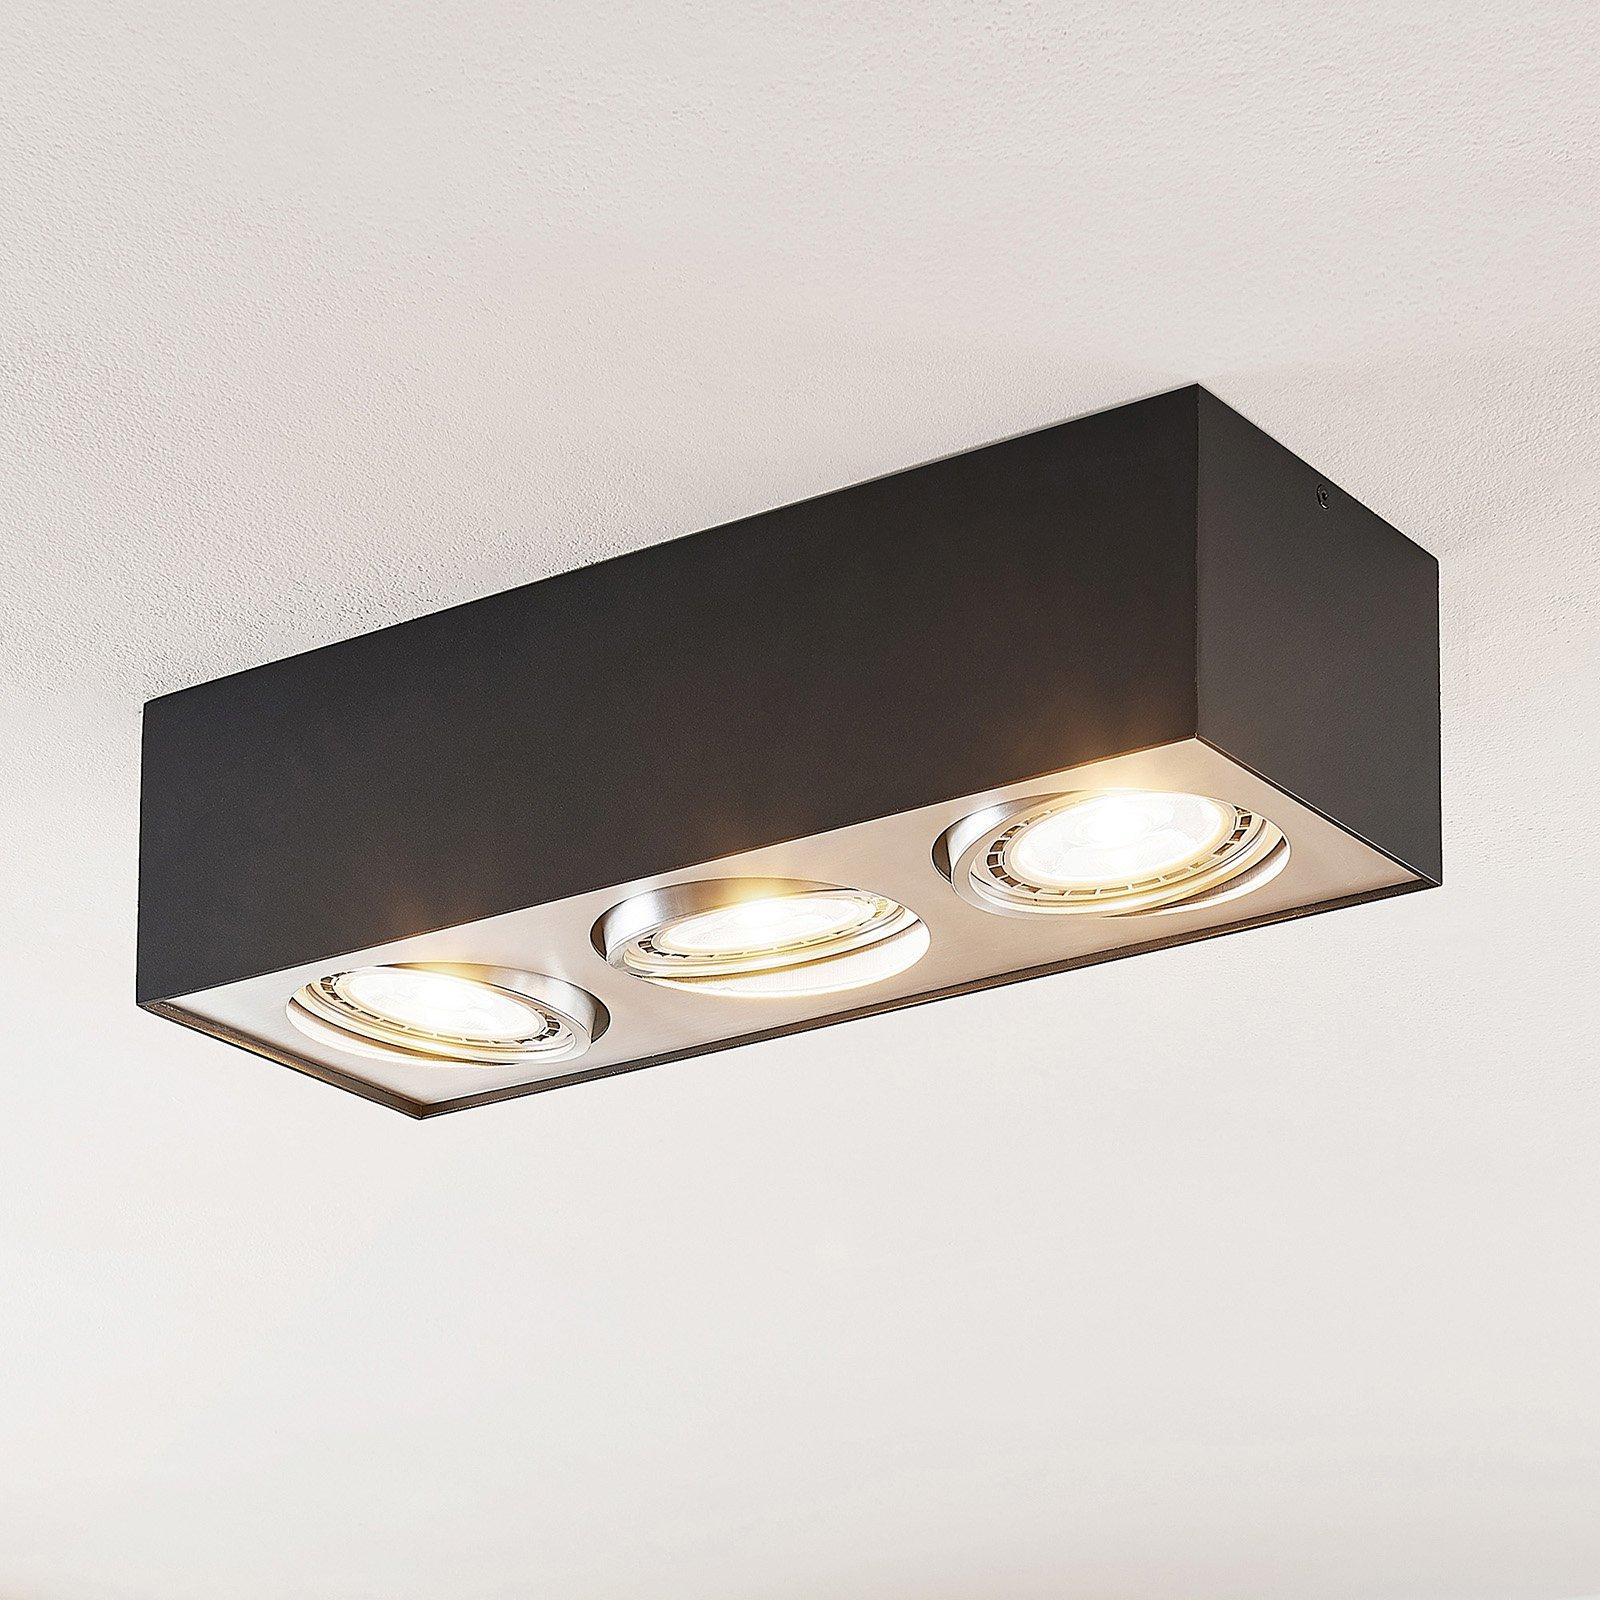 Arccio Dwight LED-taklampe i svart, 3 lyskilder